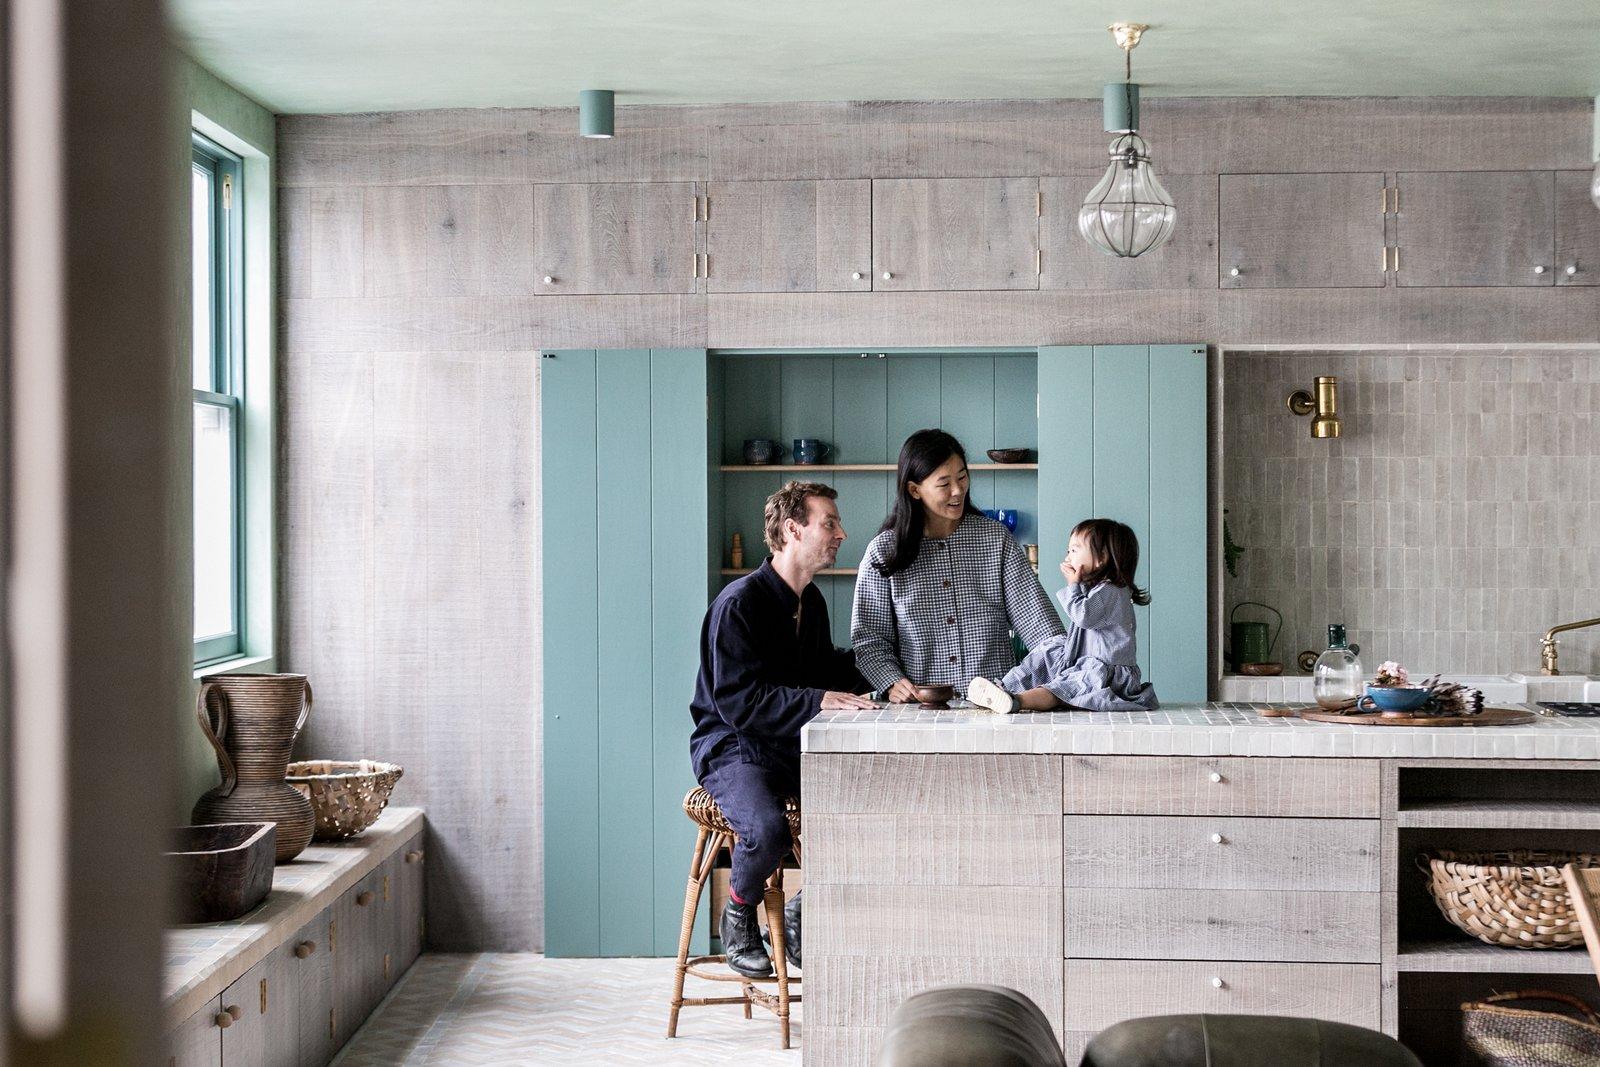 The Beldi Chan + Eayrs kitchen